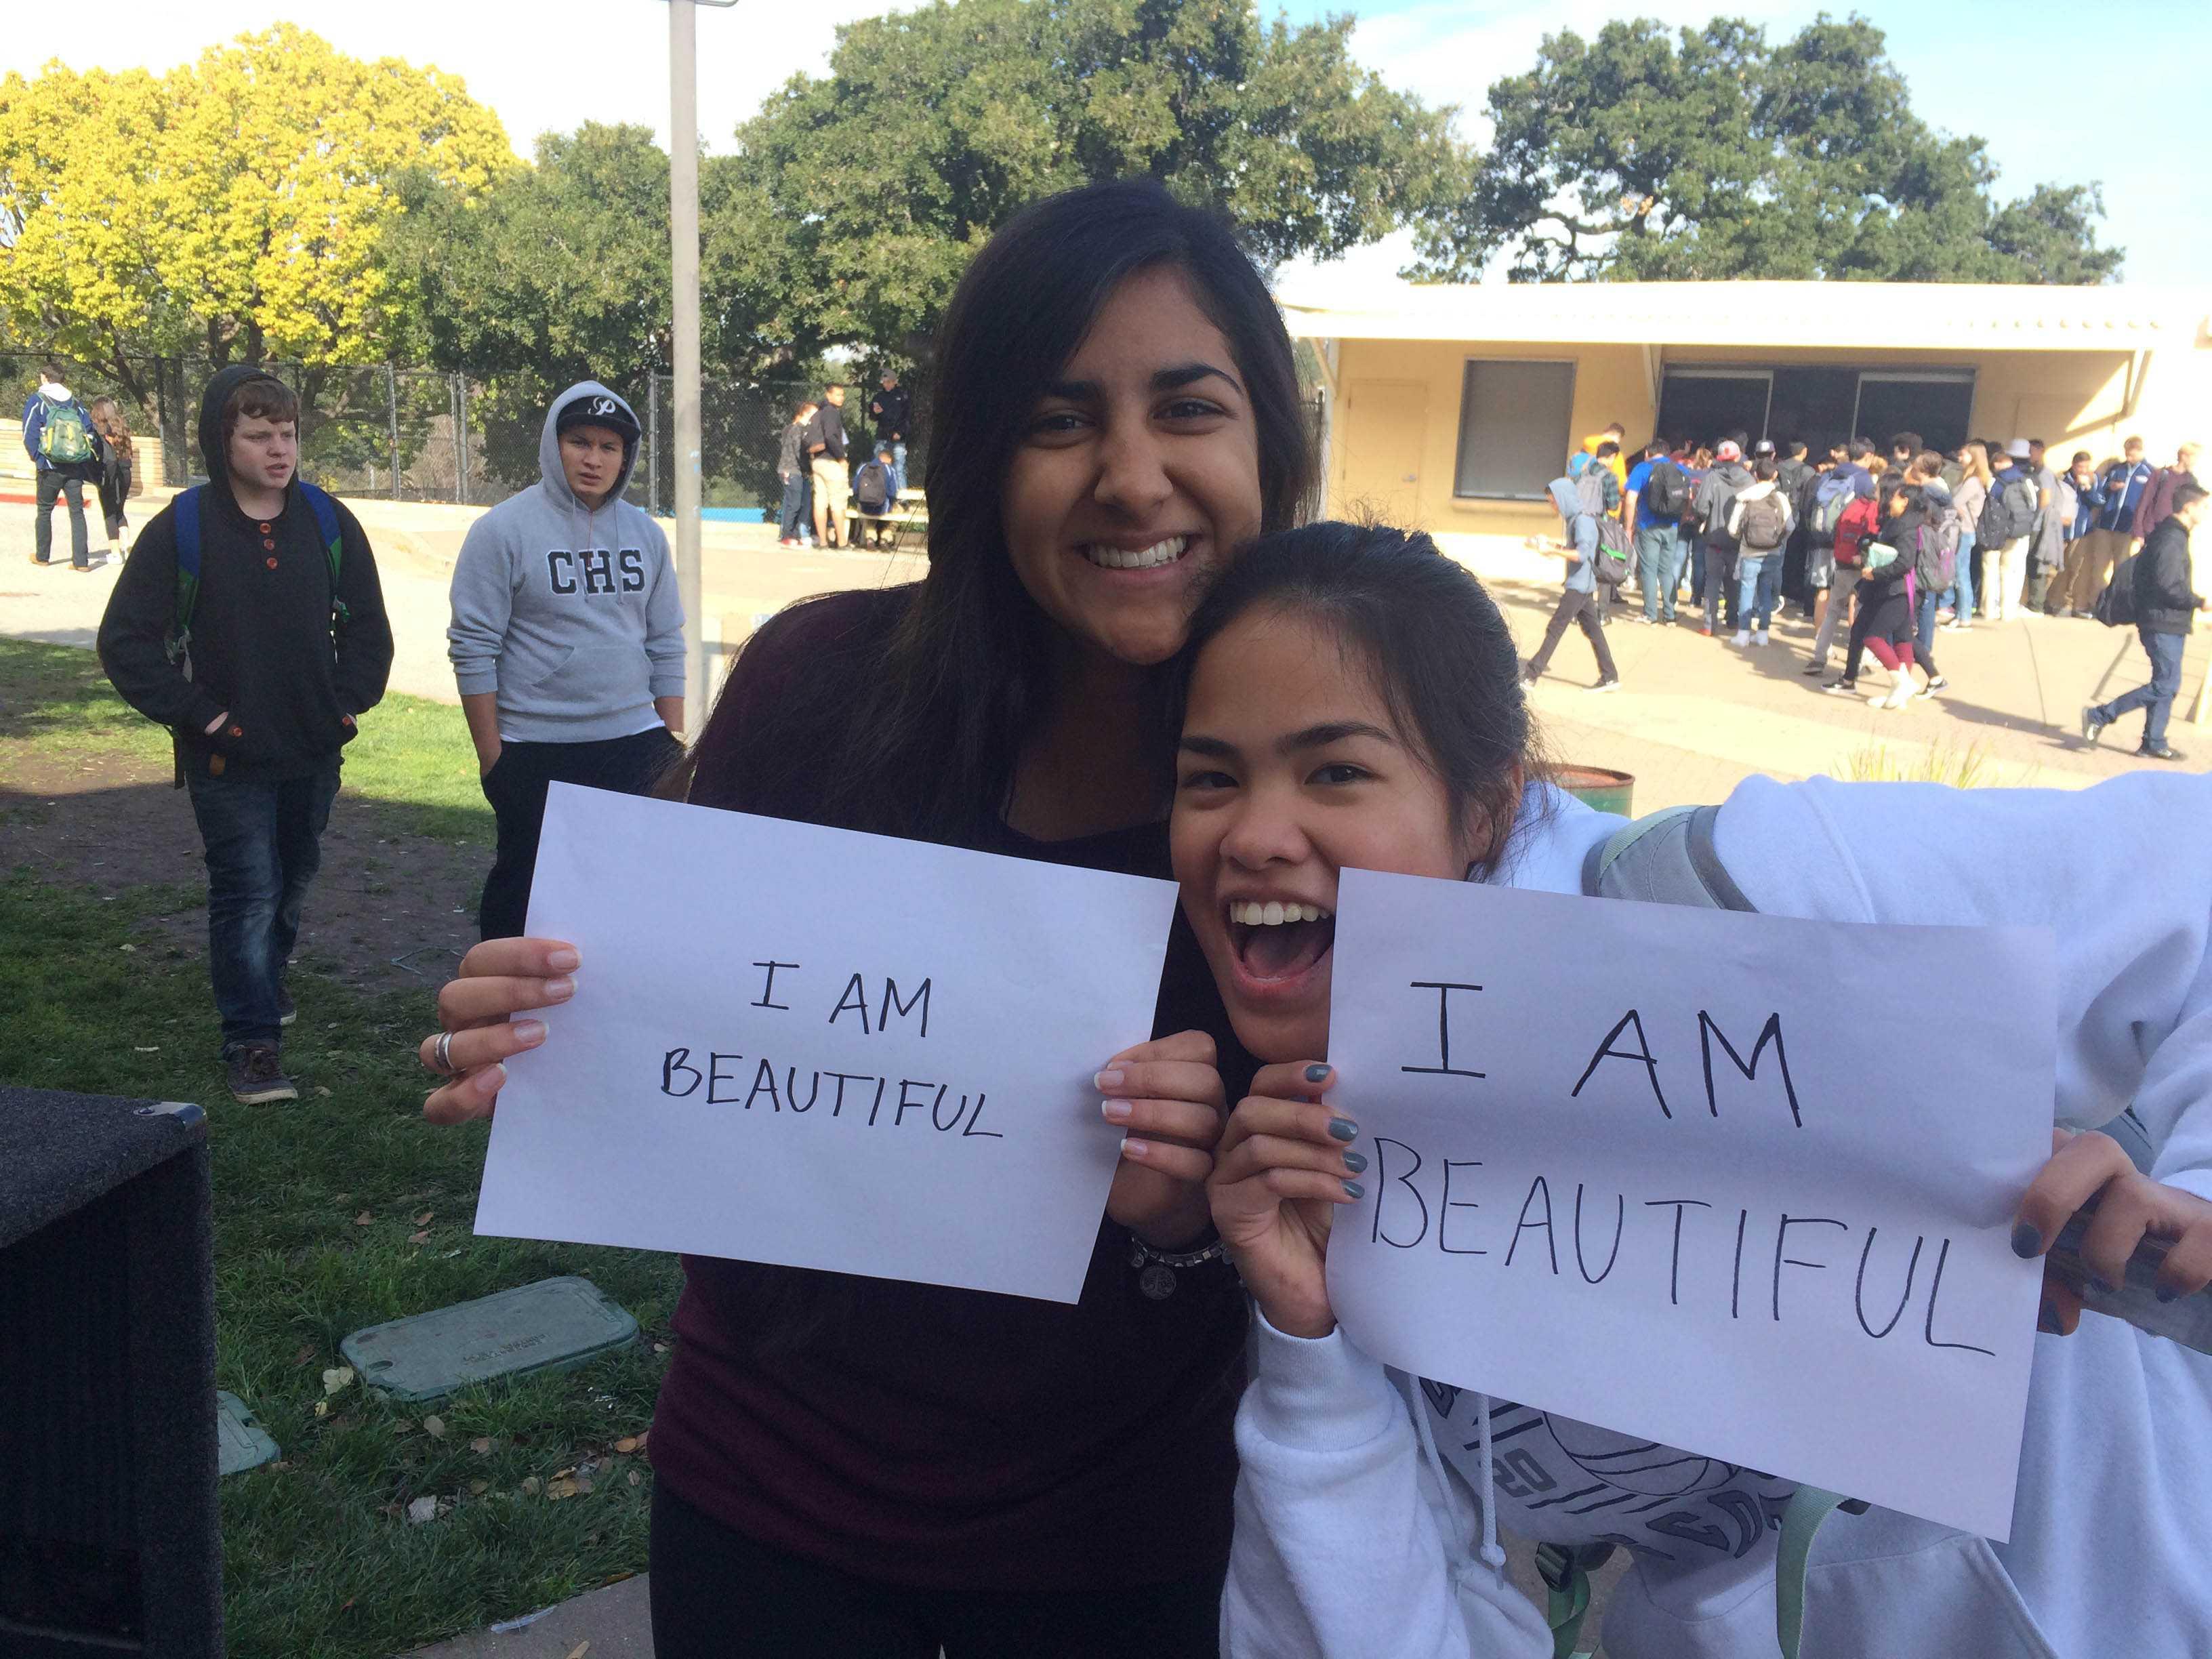 Junior Millan Kanaya and sophomore Tyrese Lopez celebrate their beauty.